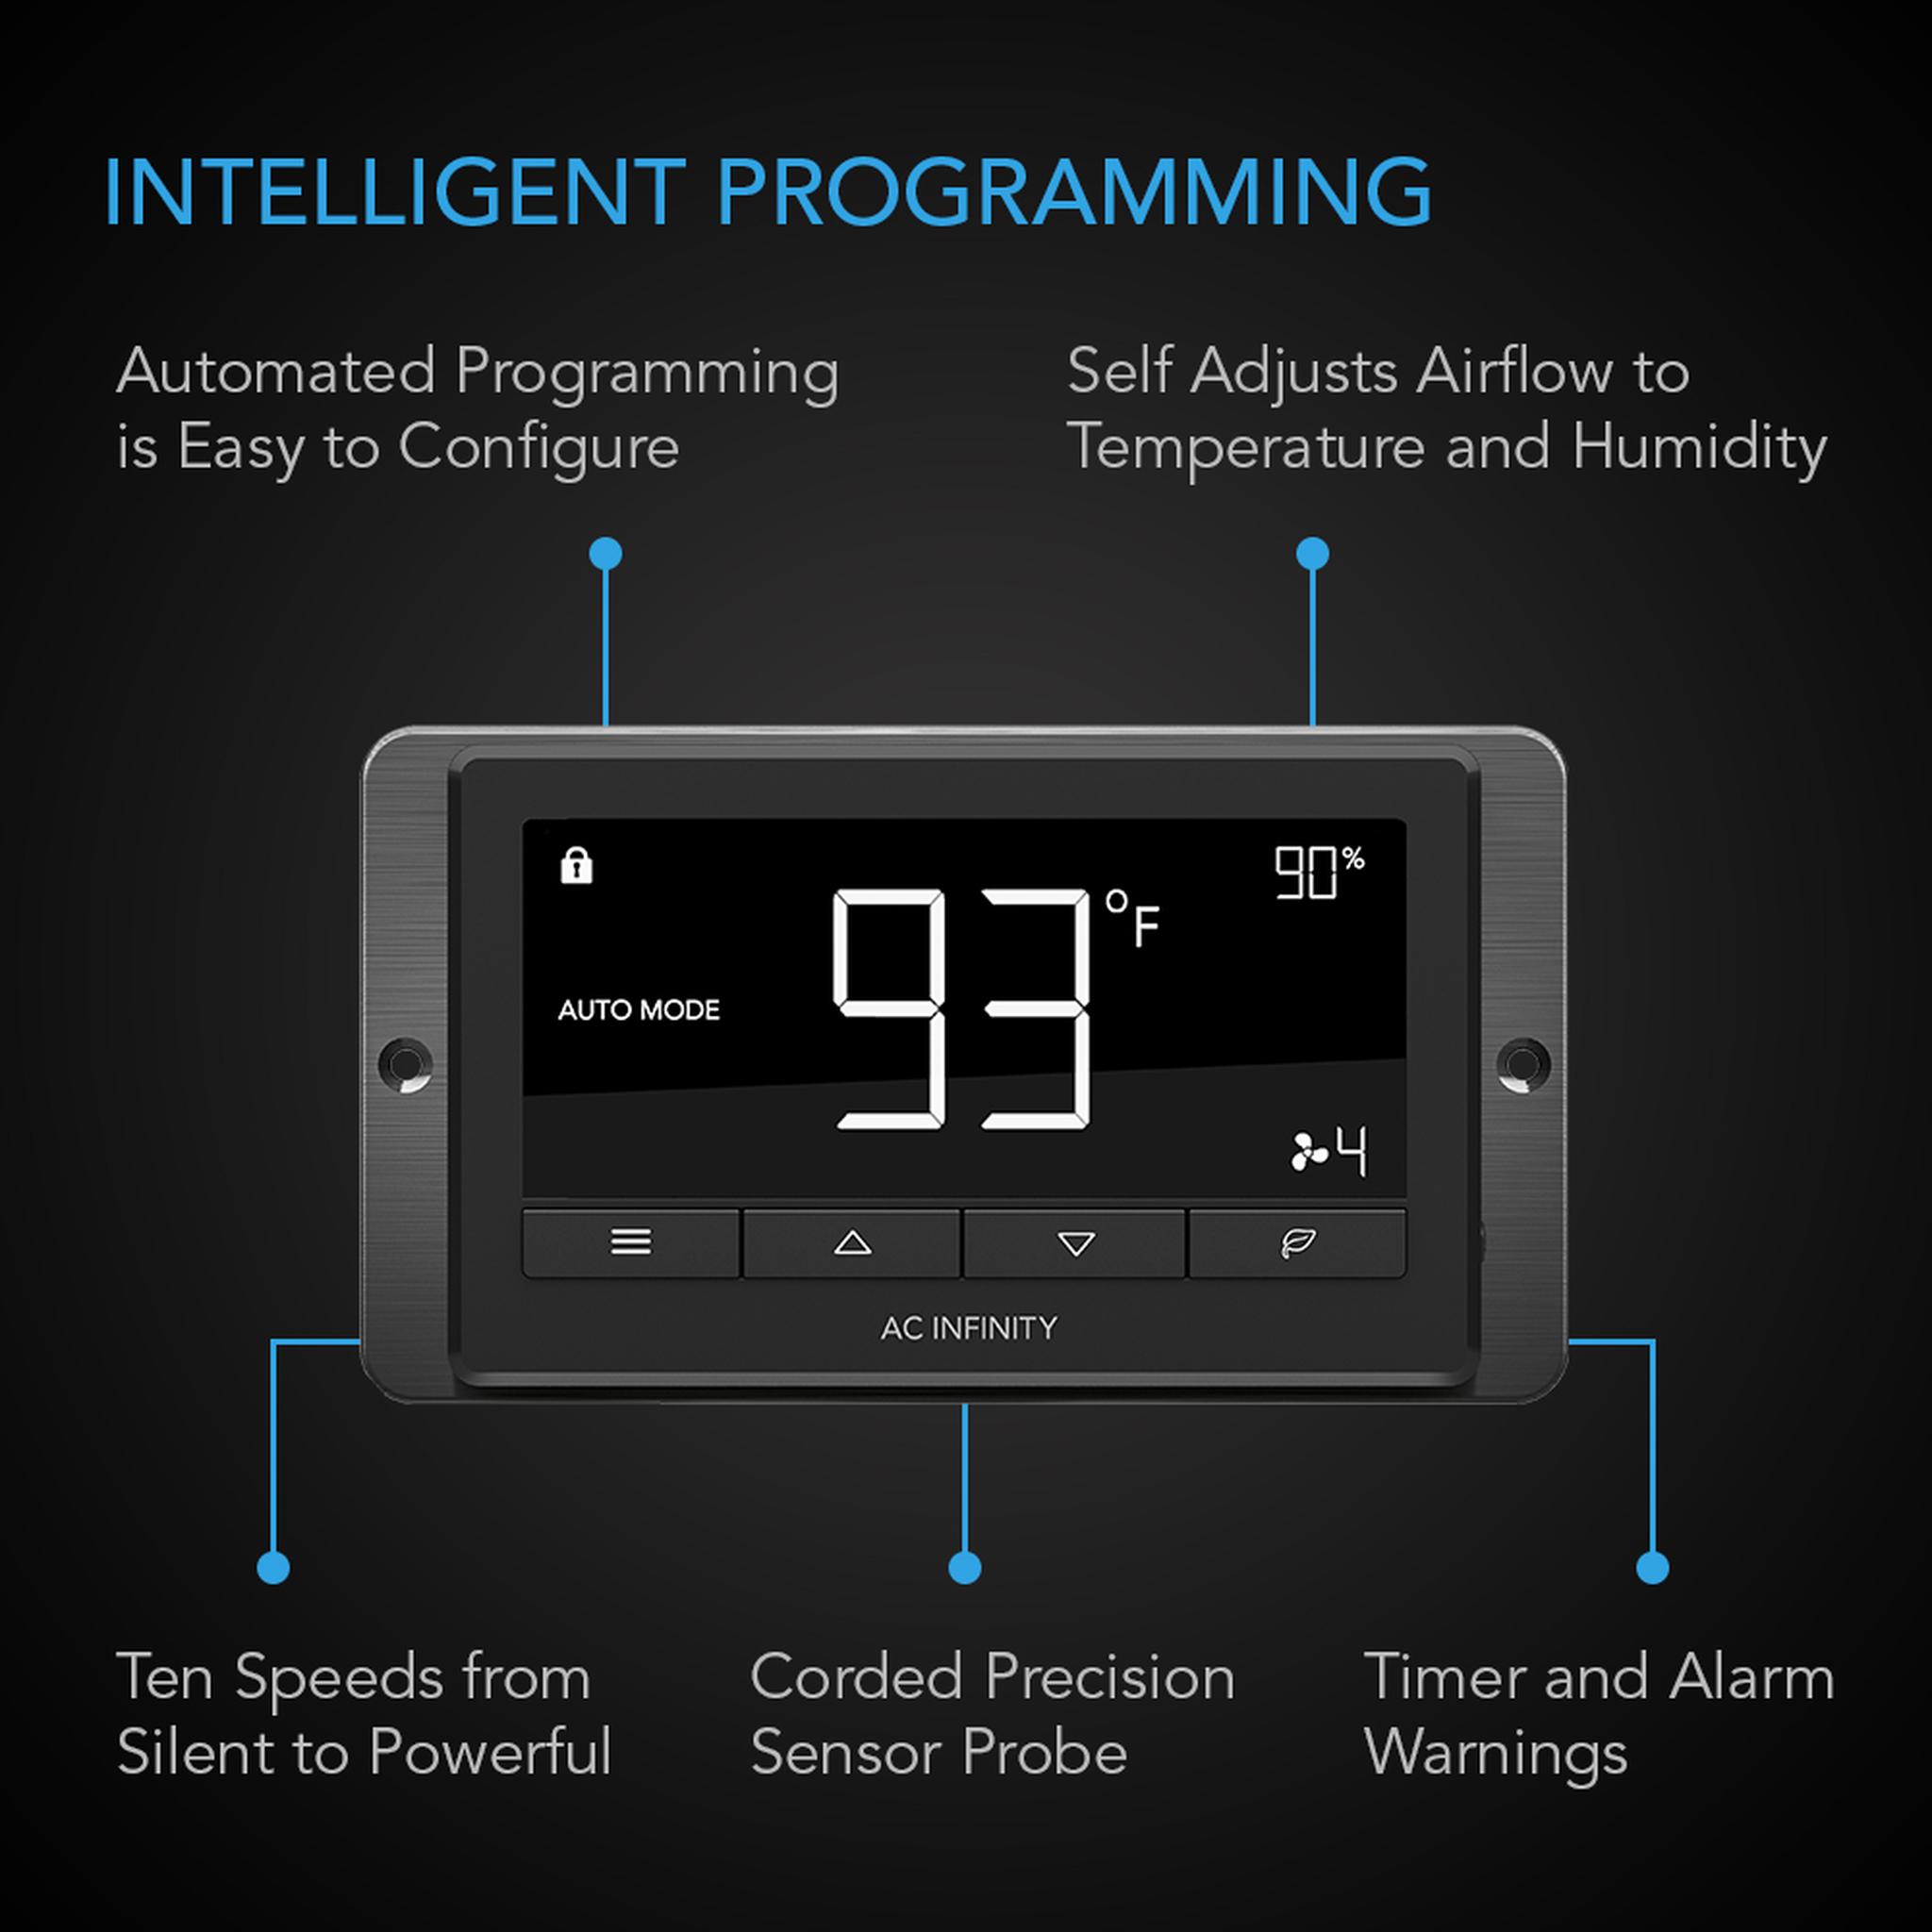 Intelligent Programing